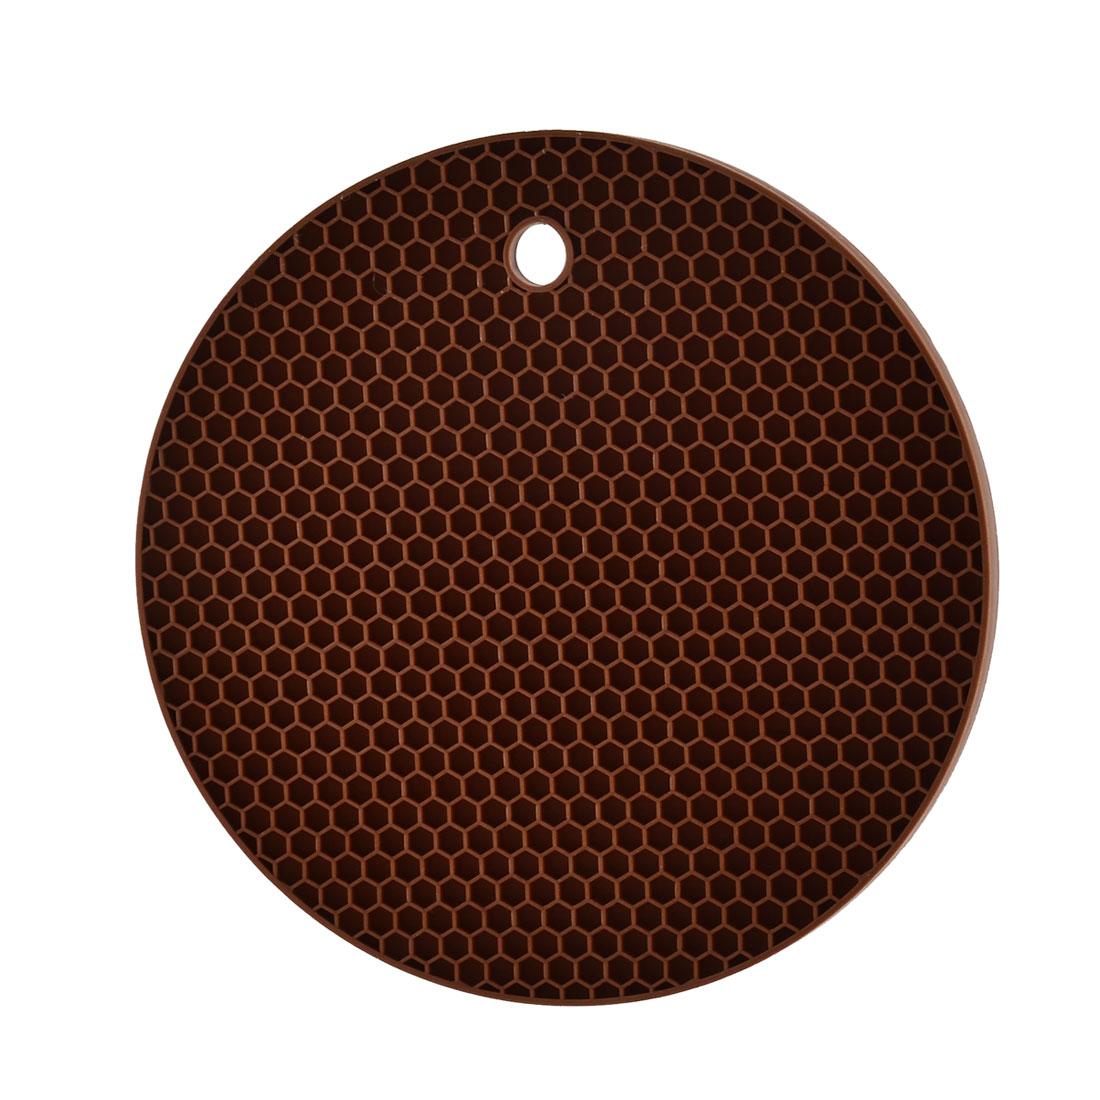 Kitchen Hot Pot Pan Bowl Round Shaped Heat Resistant Mat Pad Coaster Brown